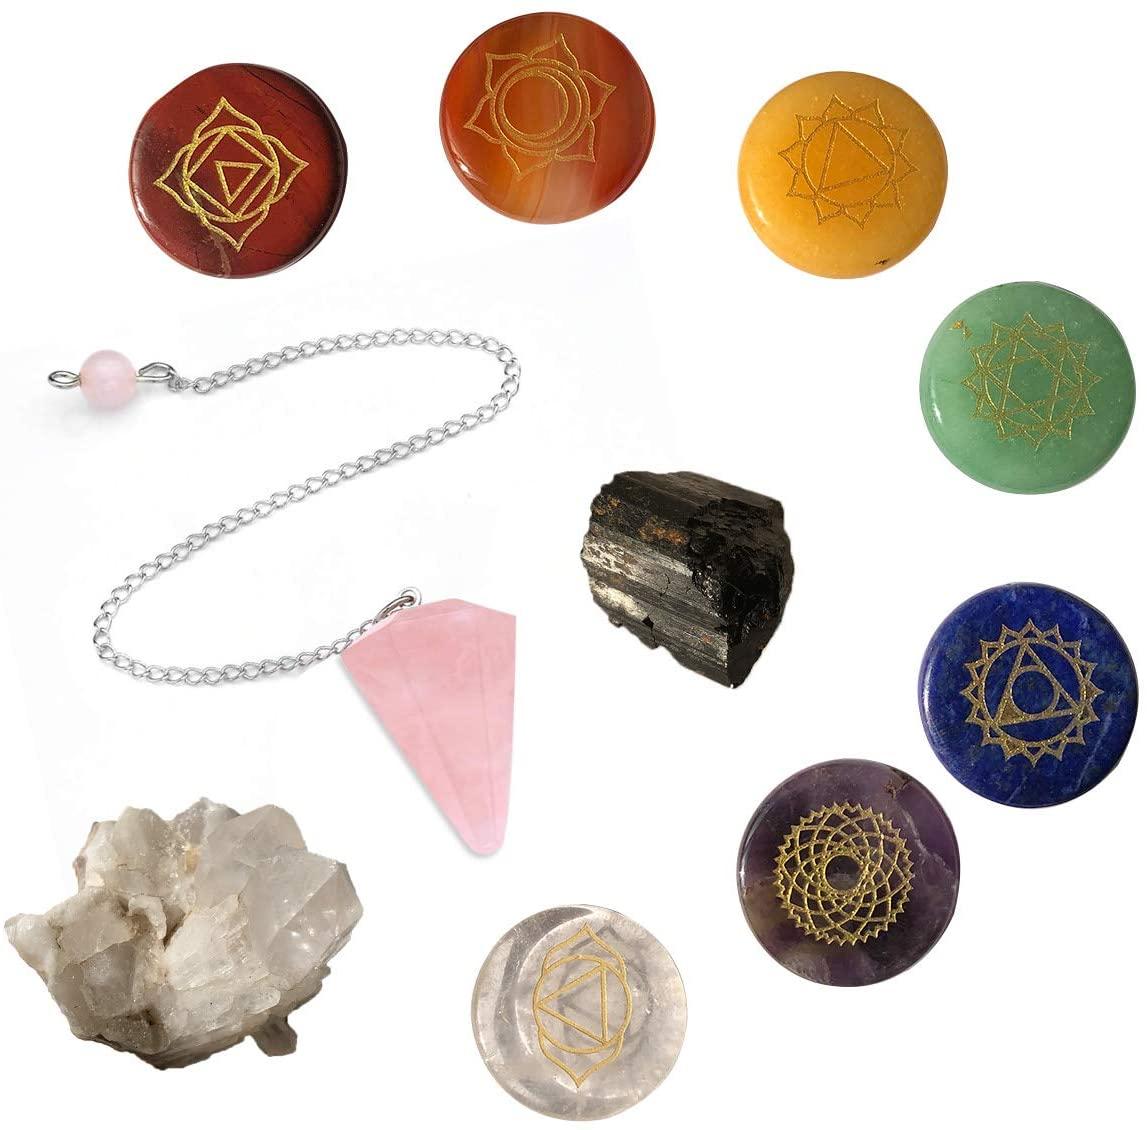 Funny Gems 10pcs Healing Crystal Reiki Chakra Stones Kit with Engraved Chakra Symbols Clear Crystal Cluster Black Tourmaline Rose Quartz Pendulum